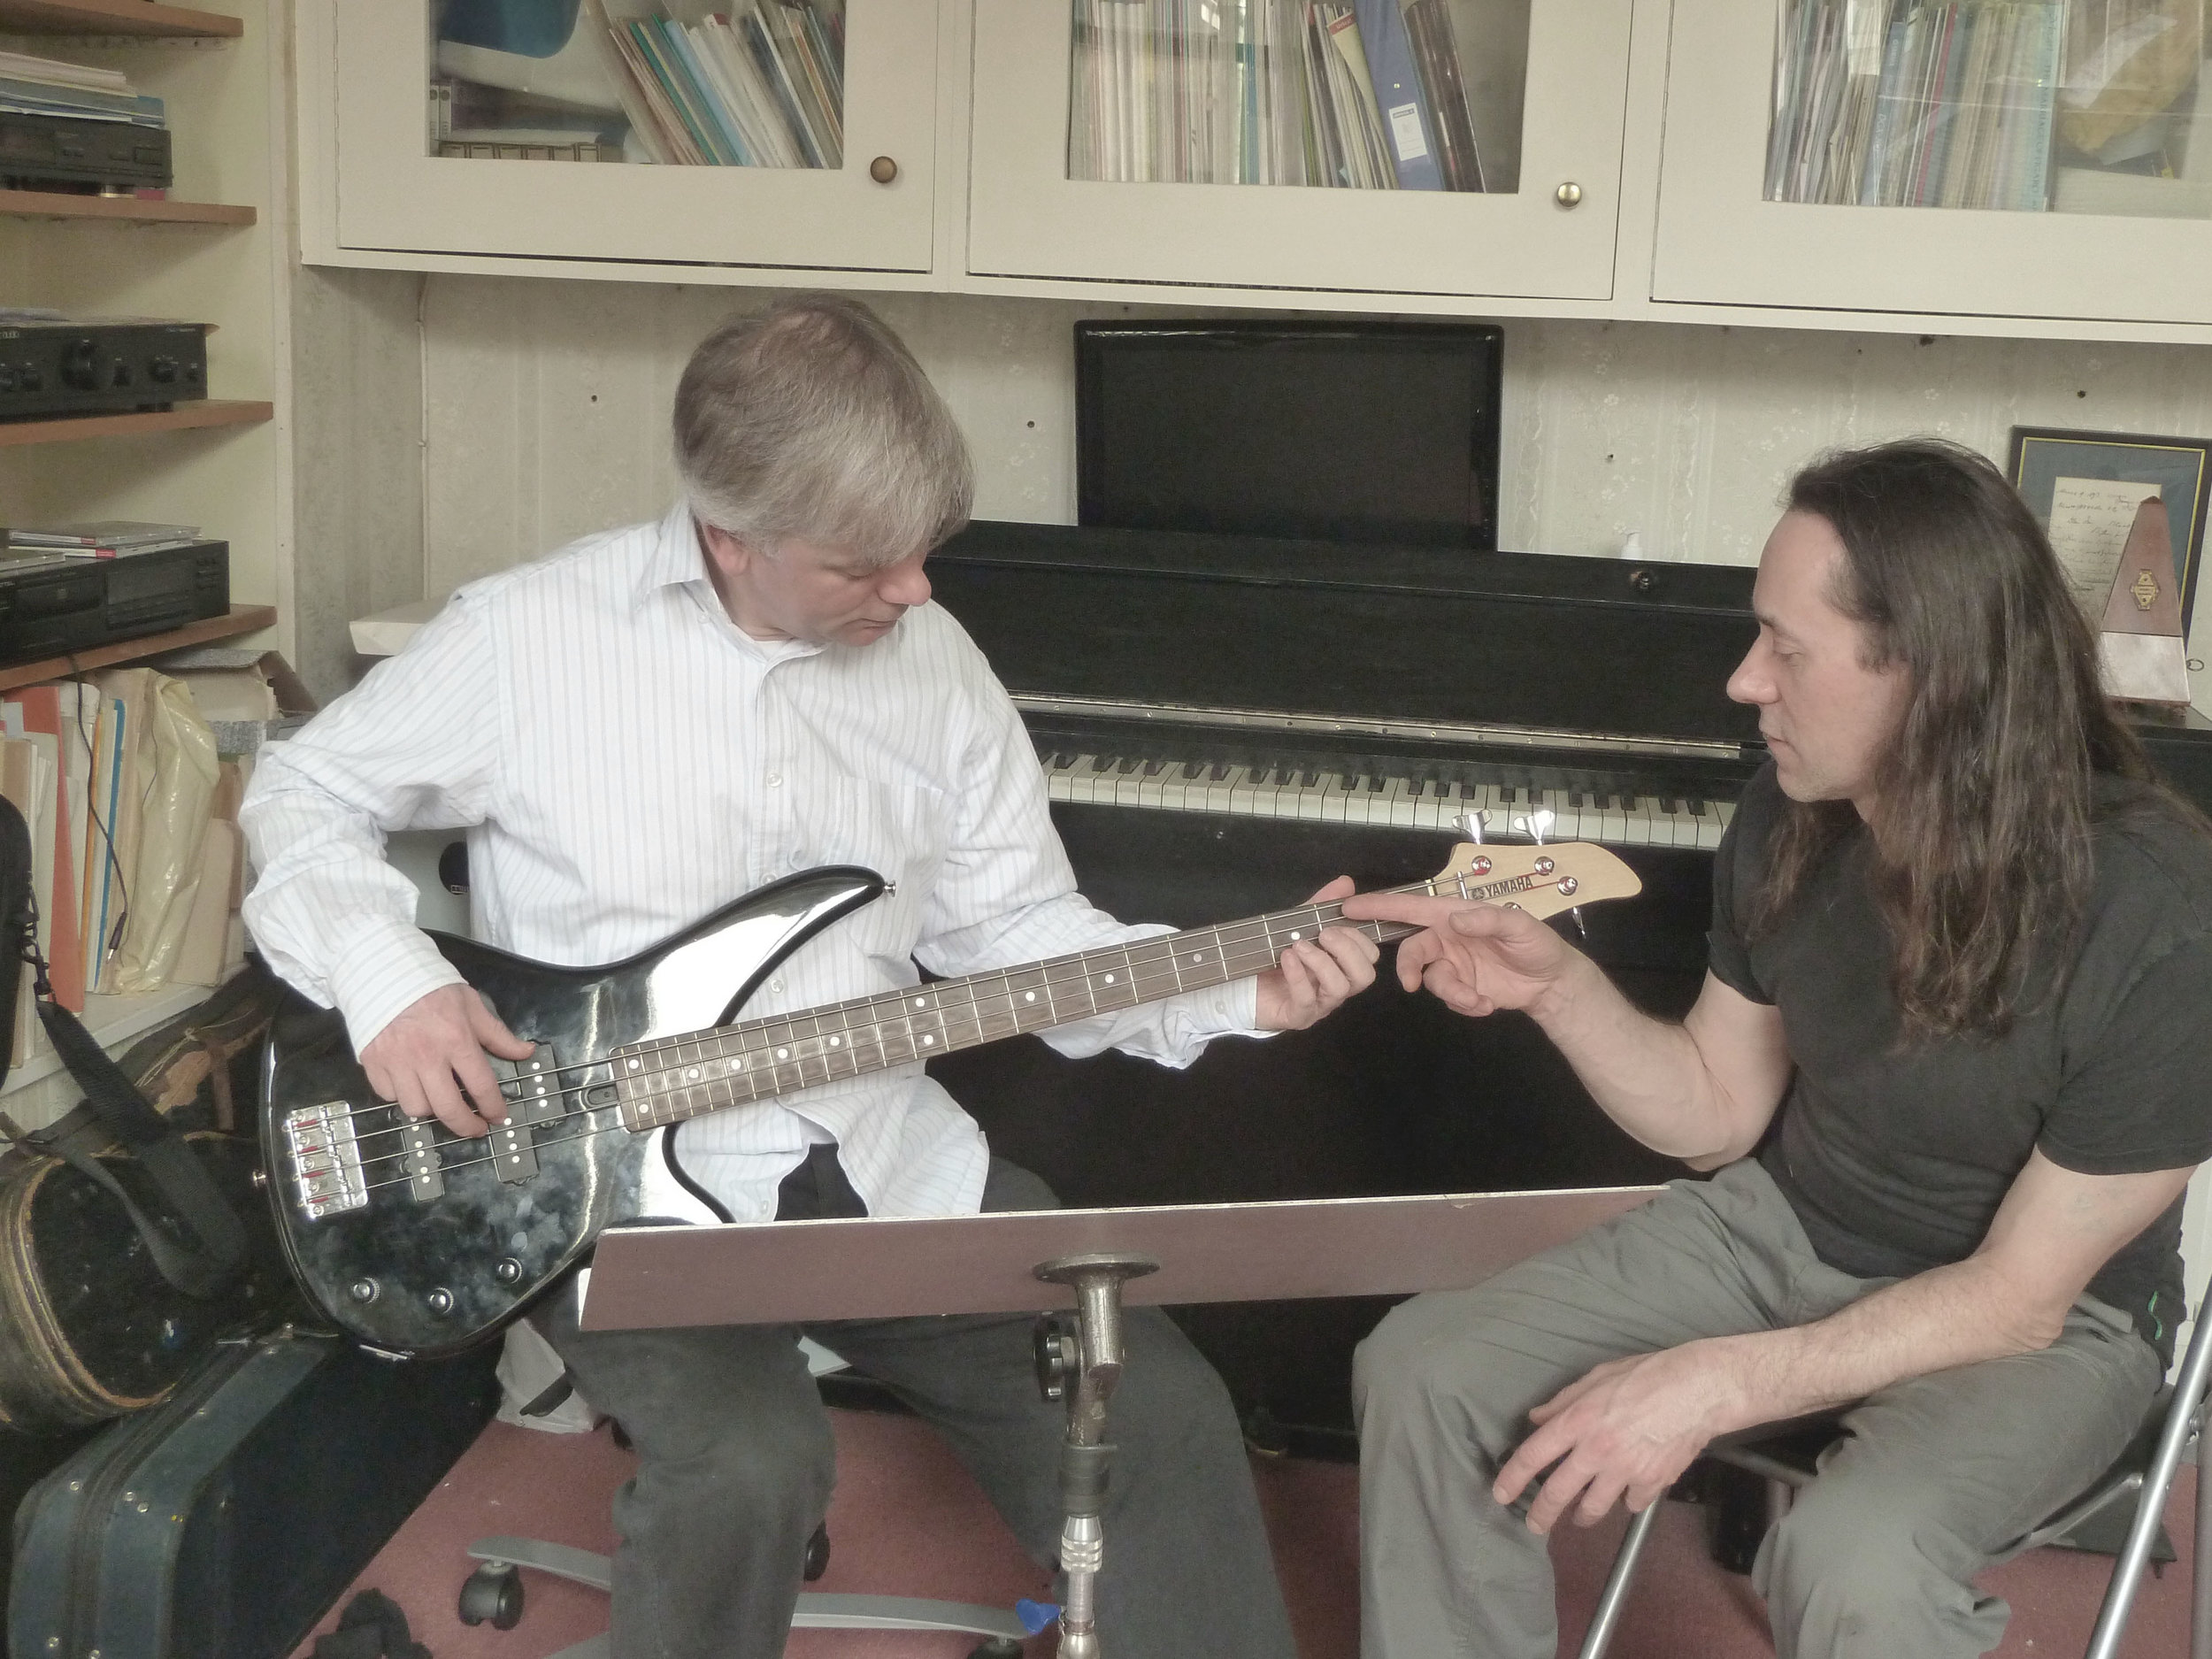 music-lessons-edinburgh-bass-guitar.jpg